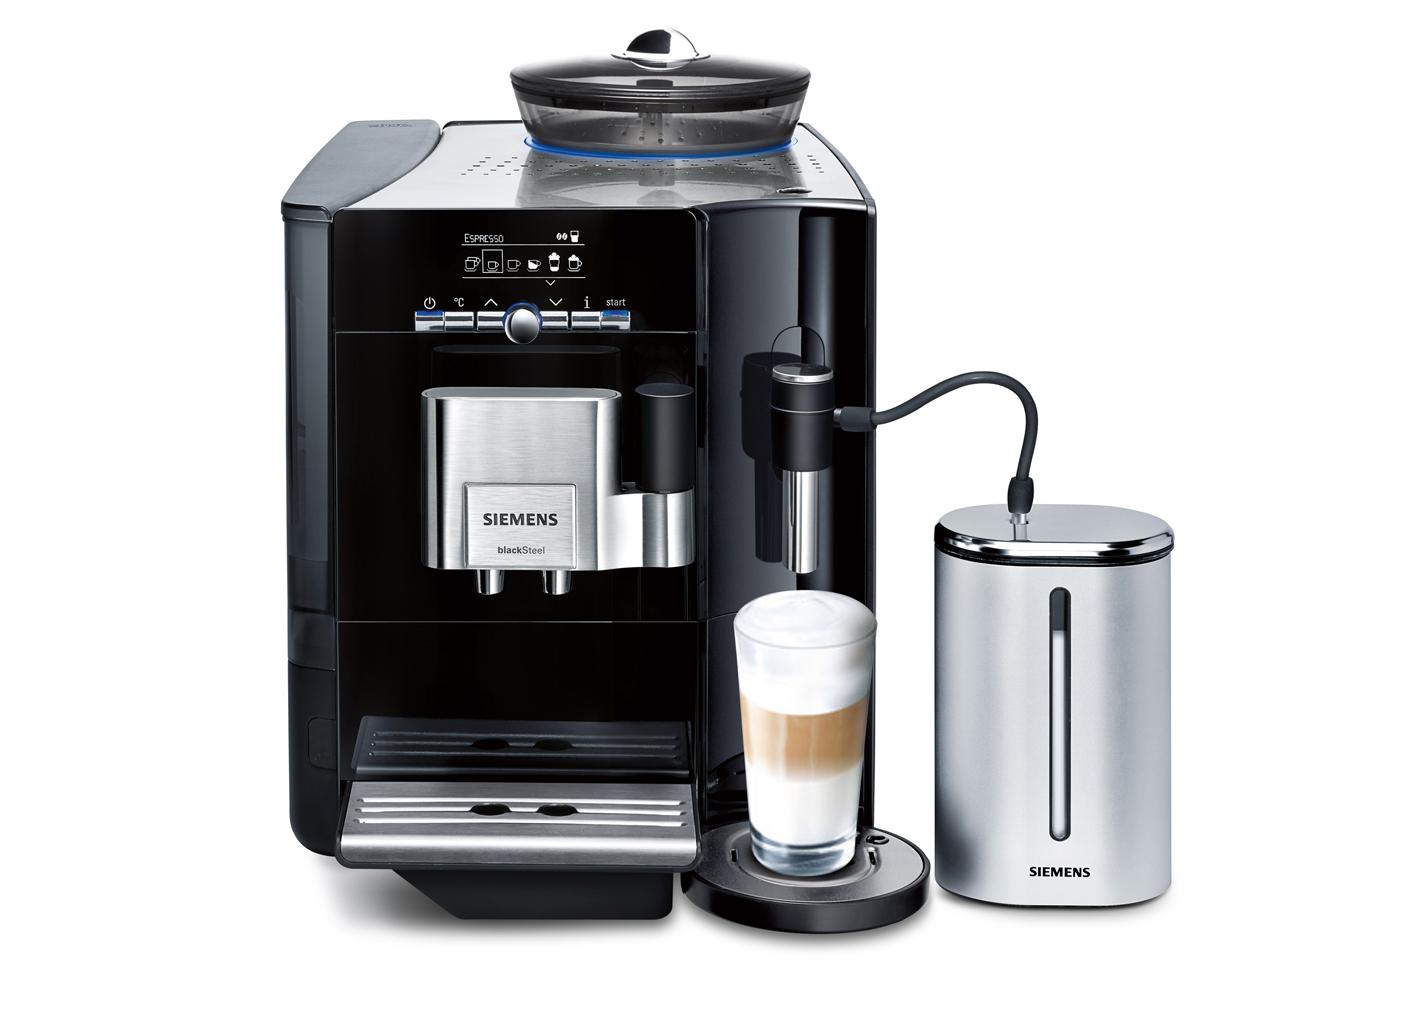 siemens eq 7 plus blacksteel kaffeevollautomat espresso in expressiver form. Black Bedroom Furniture Sets. Home Design Ideas